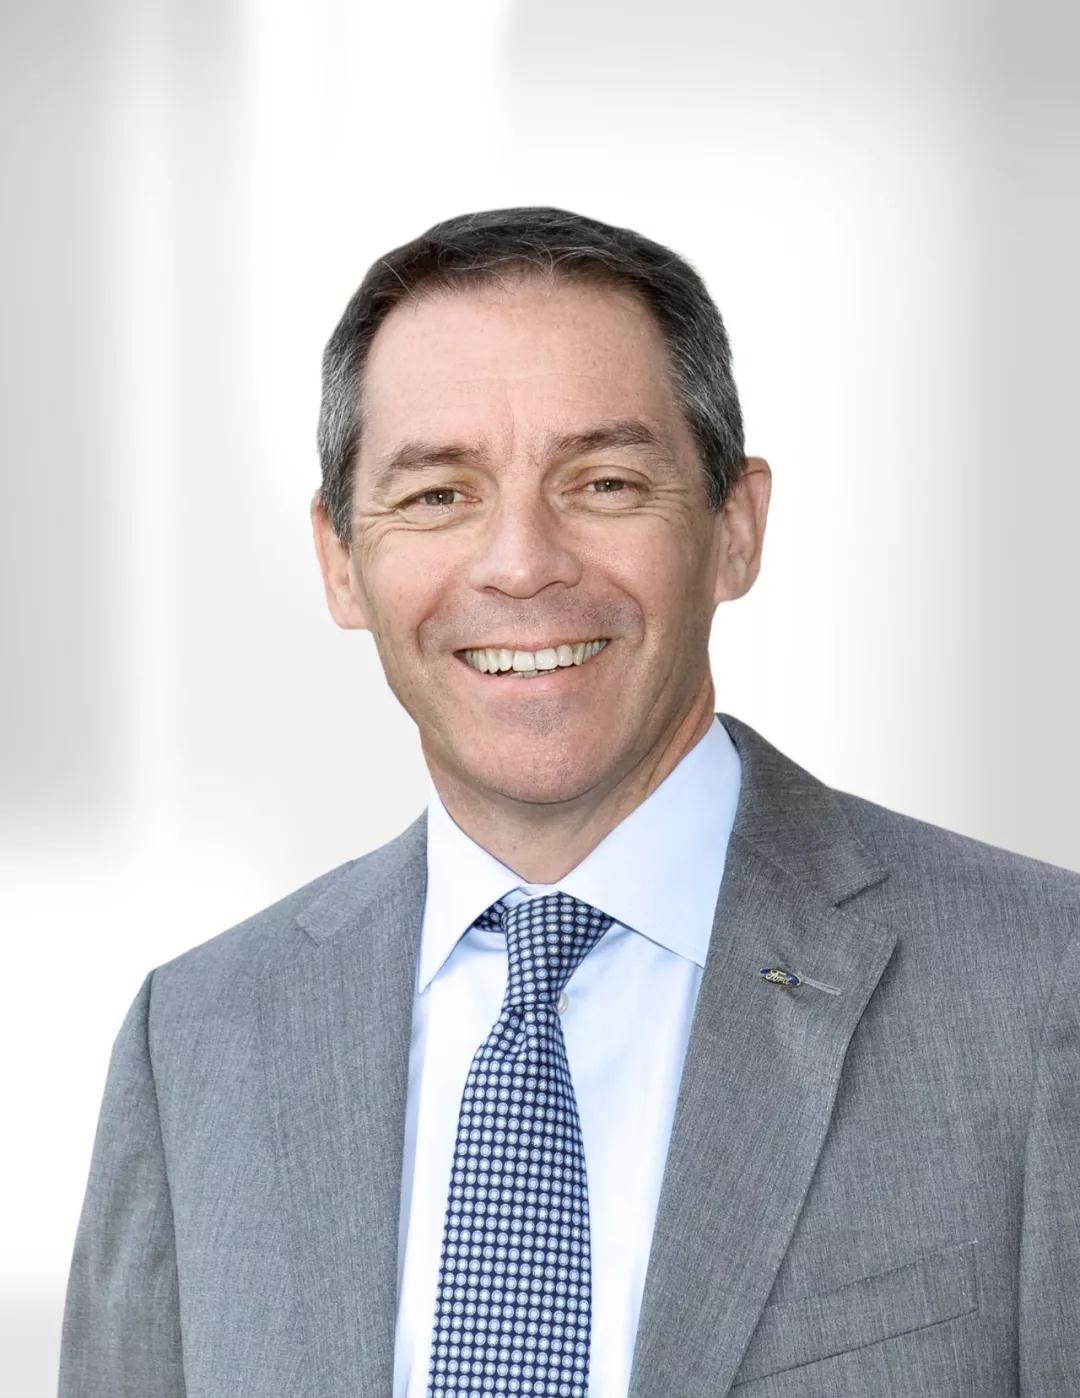 Steven Armstrong将出任长安福特总裁 何骏杰年底退休